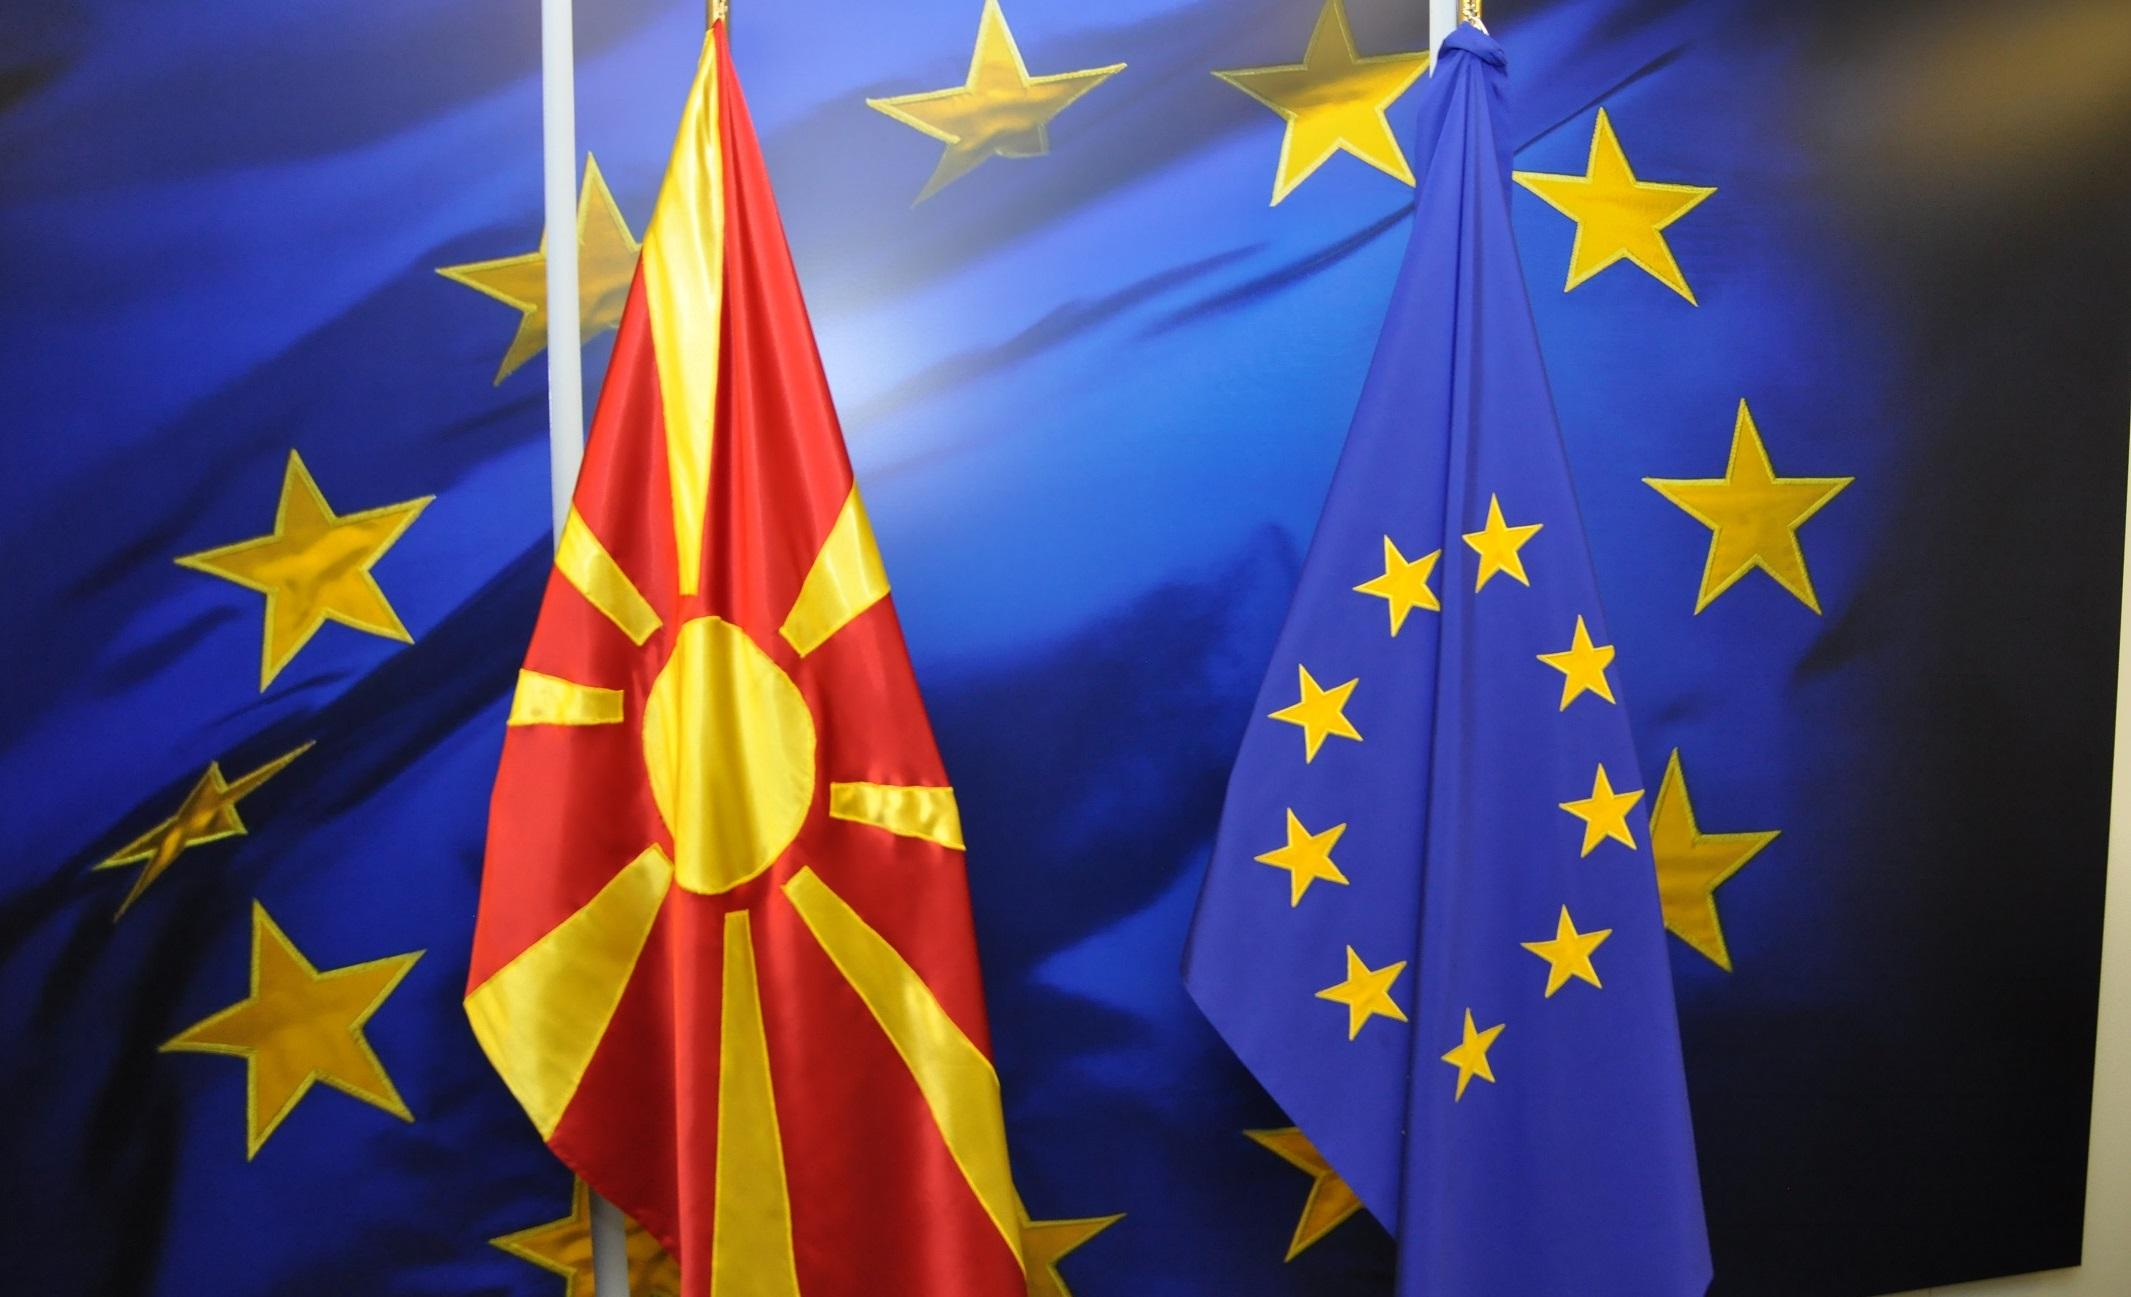 Skopje is waiting on the EU progress report